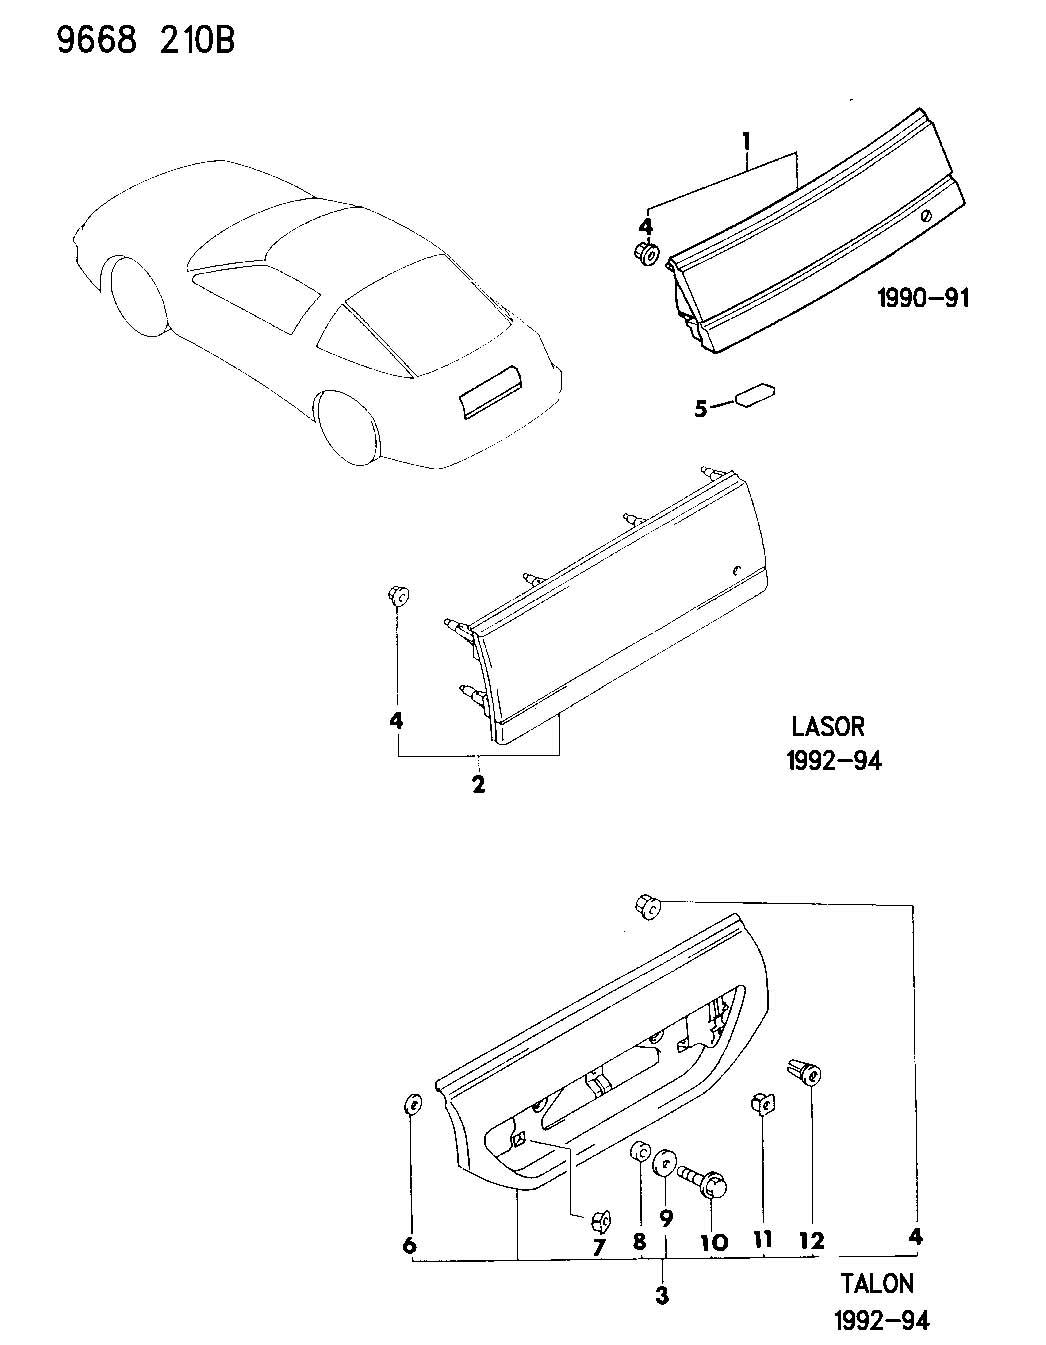 1974 toyota land cruiser wiring diagram minn kota 24 volt trolling motor vacuum auto